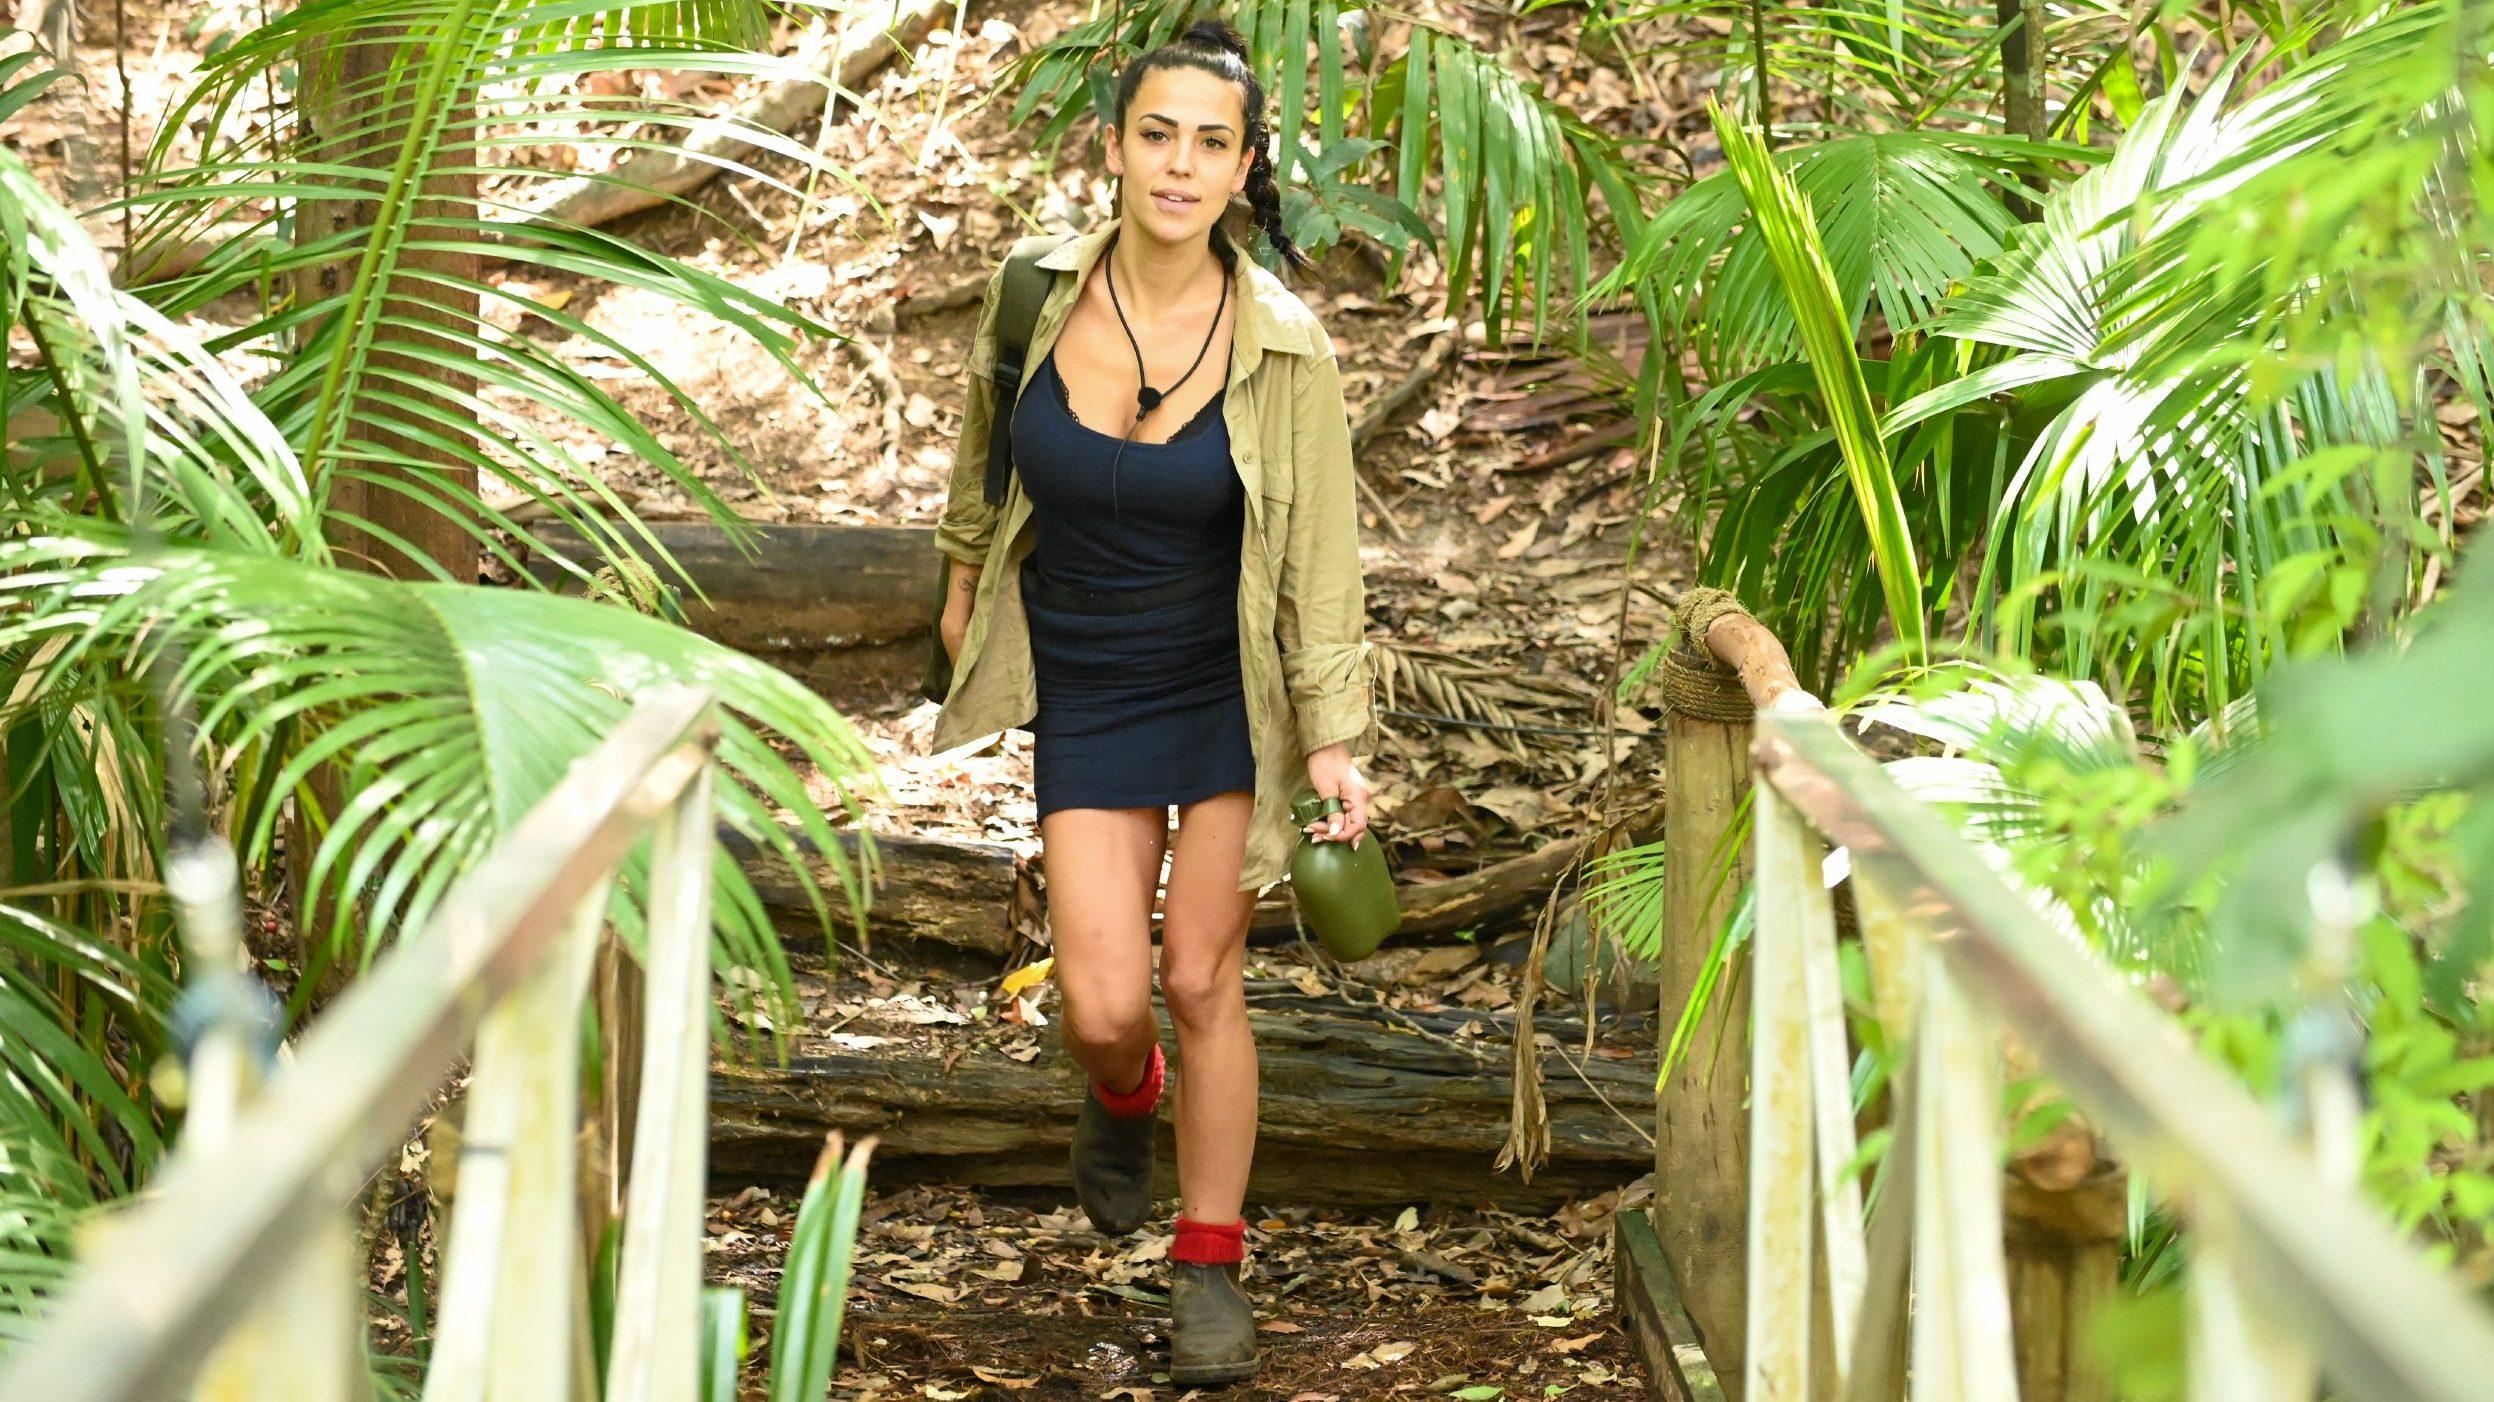 Dschungelcamp 2020 Elena Miras Auszug